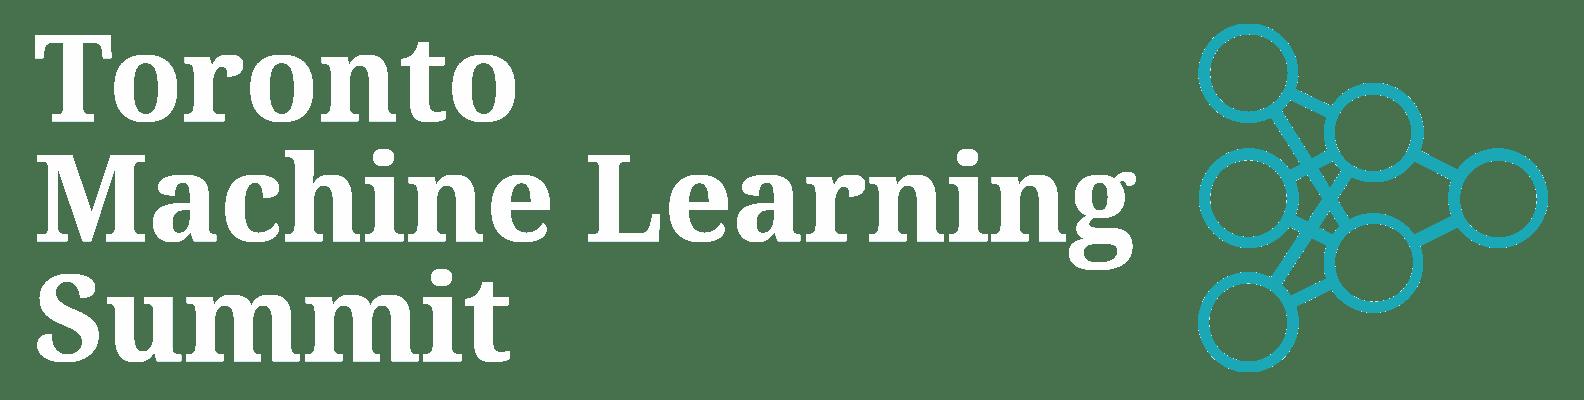 Toronto Machine Learning